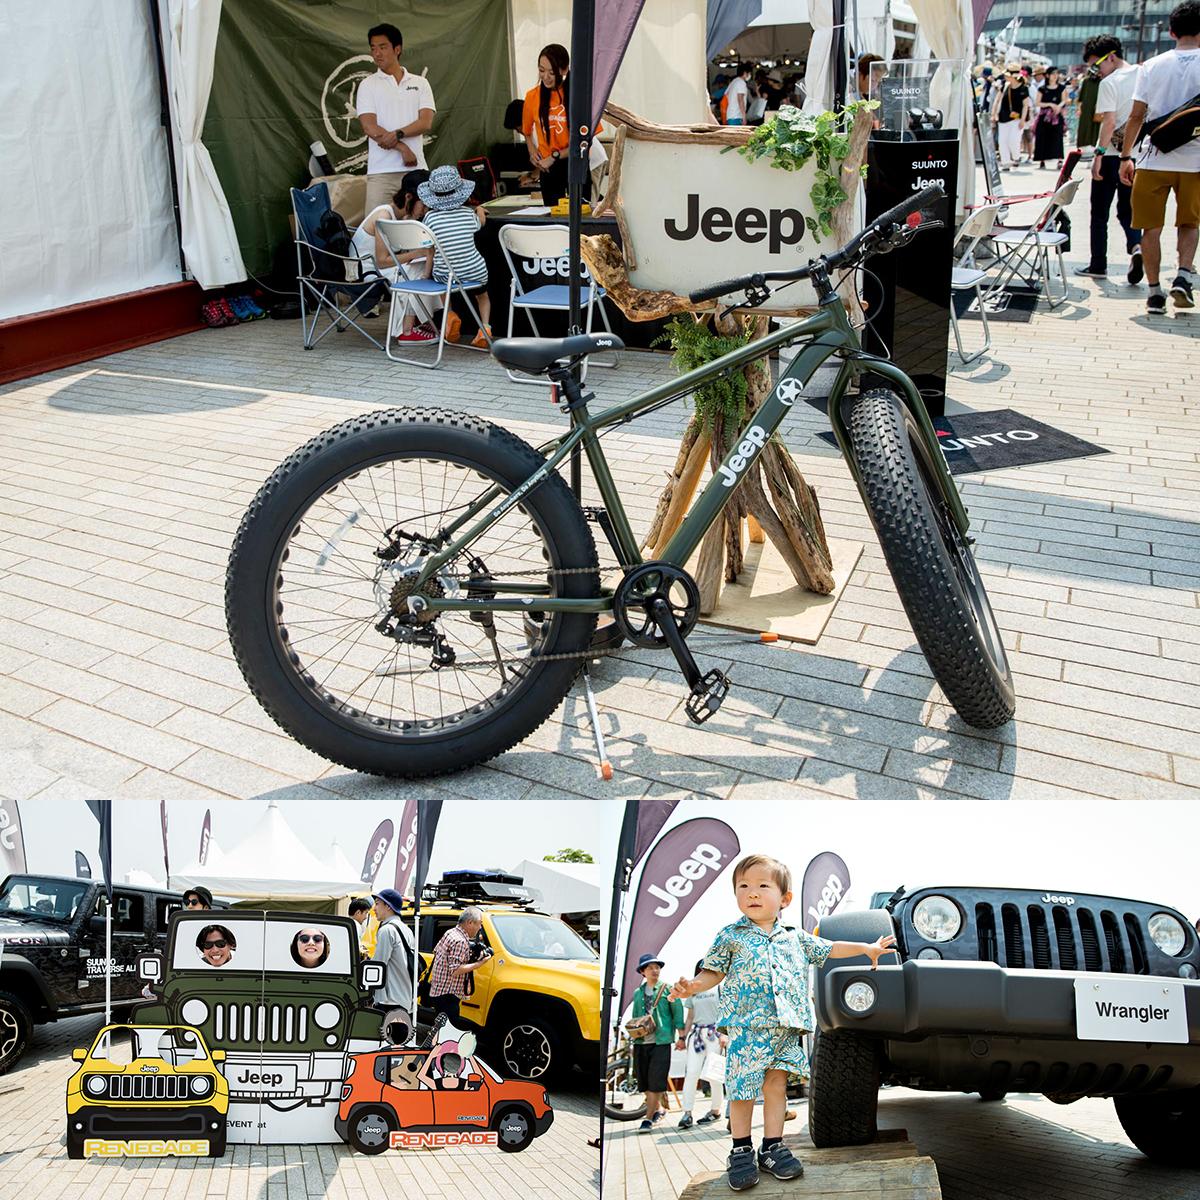 MG_3339 <GREENROOM FESTIVAL'16>フェスファッションスナップを公開!Jeep®ブースの模様もレポート!